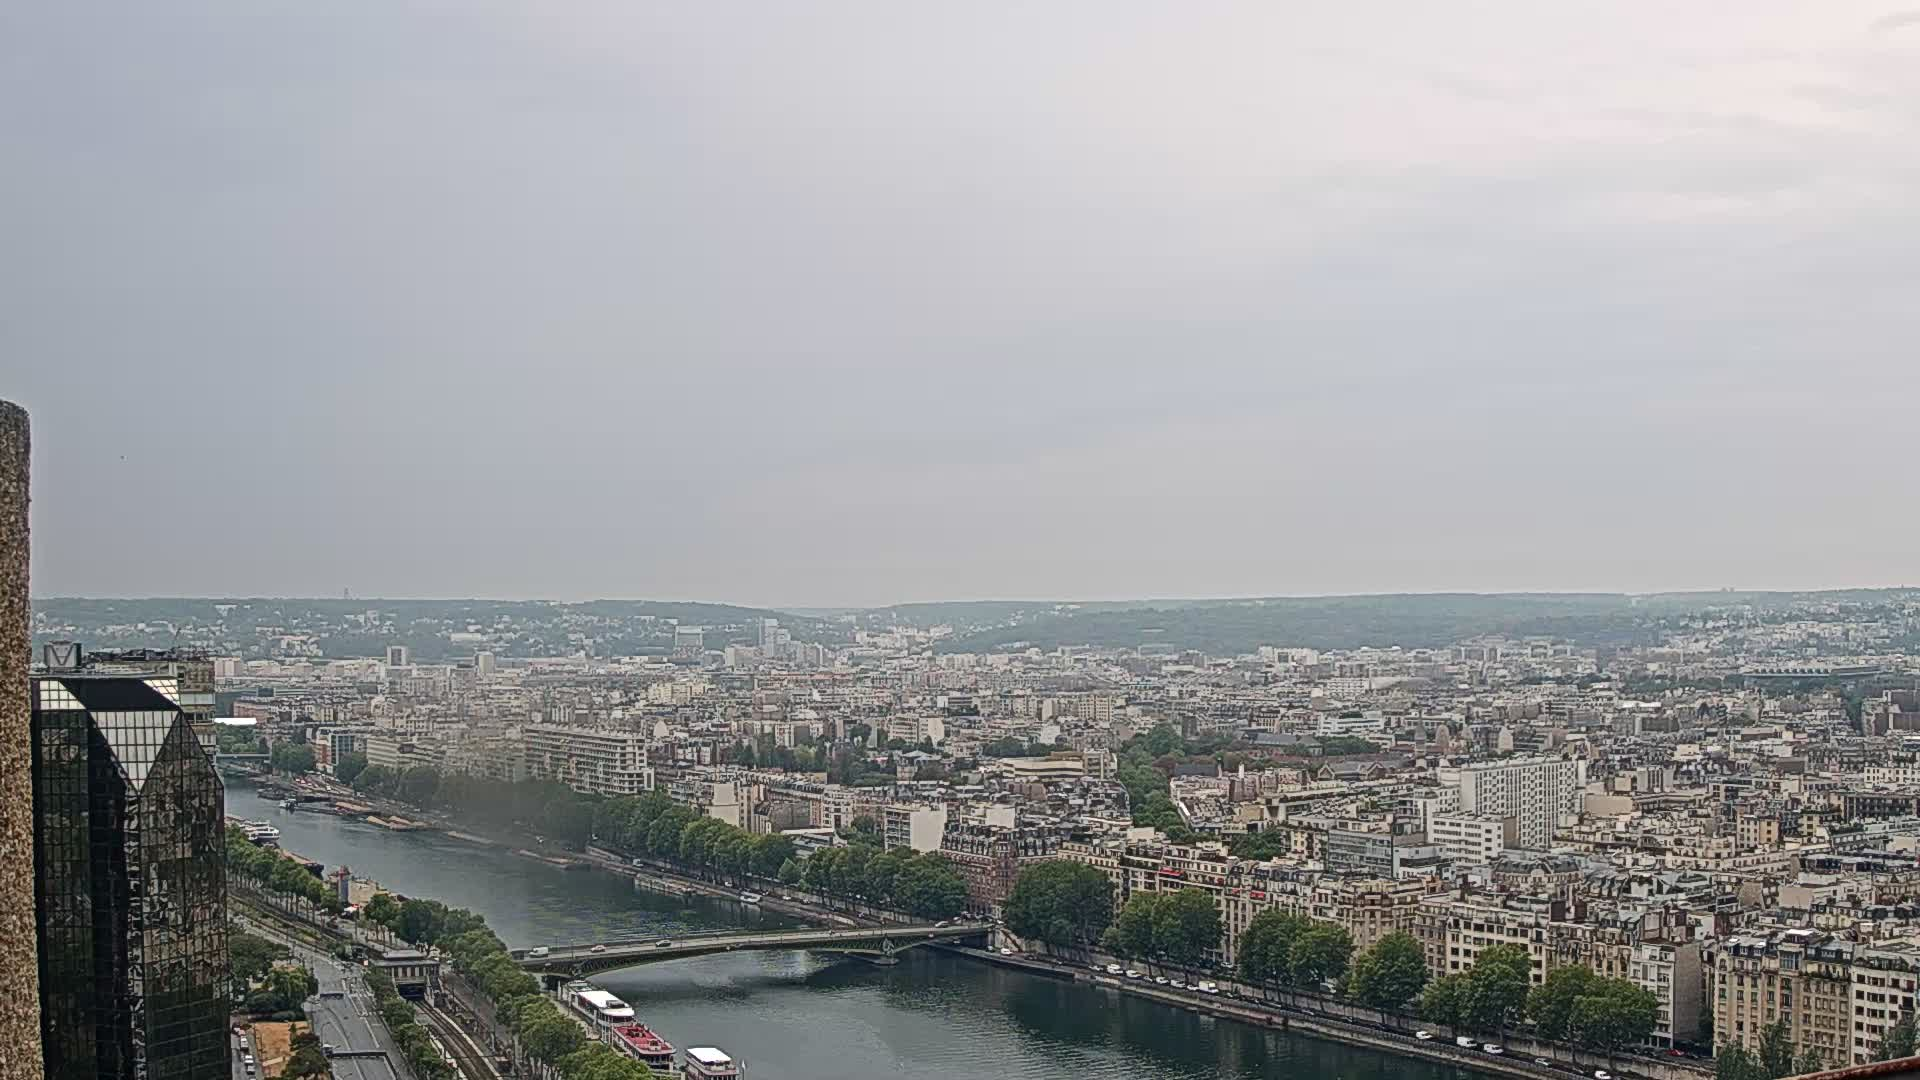 Parigi Gio. 08:24